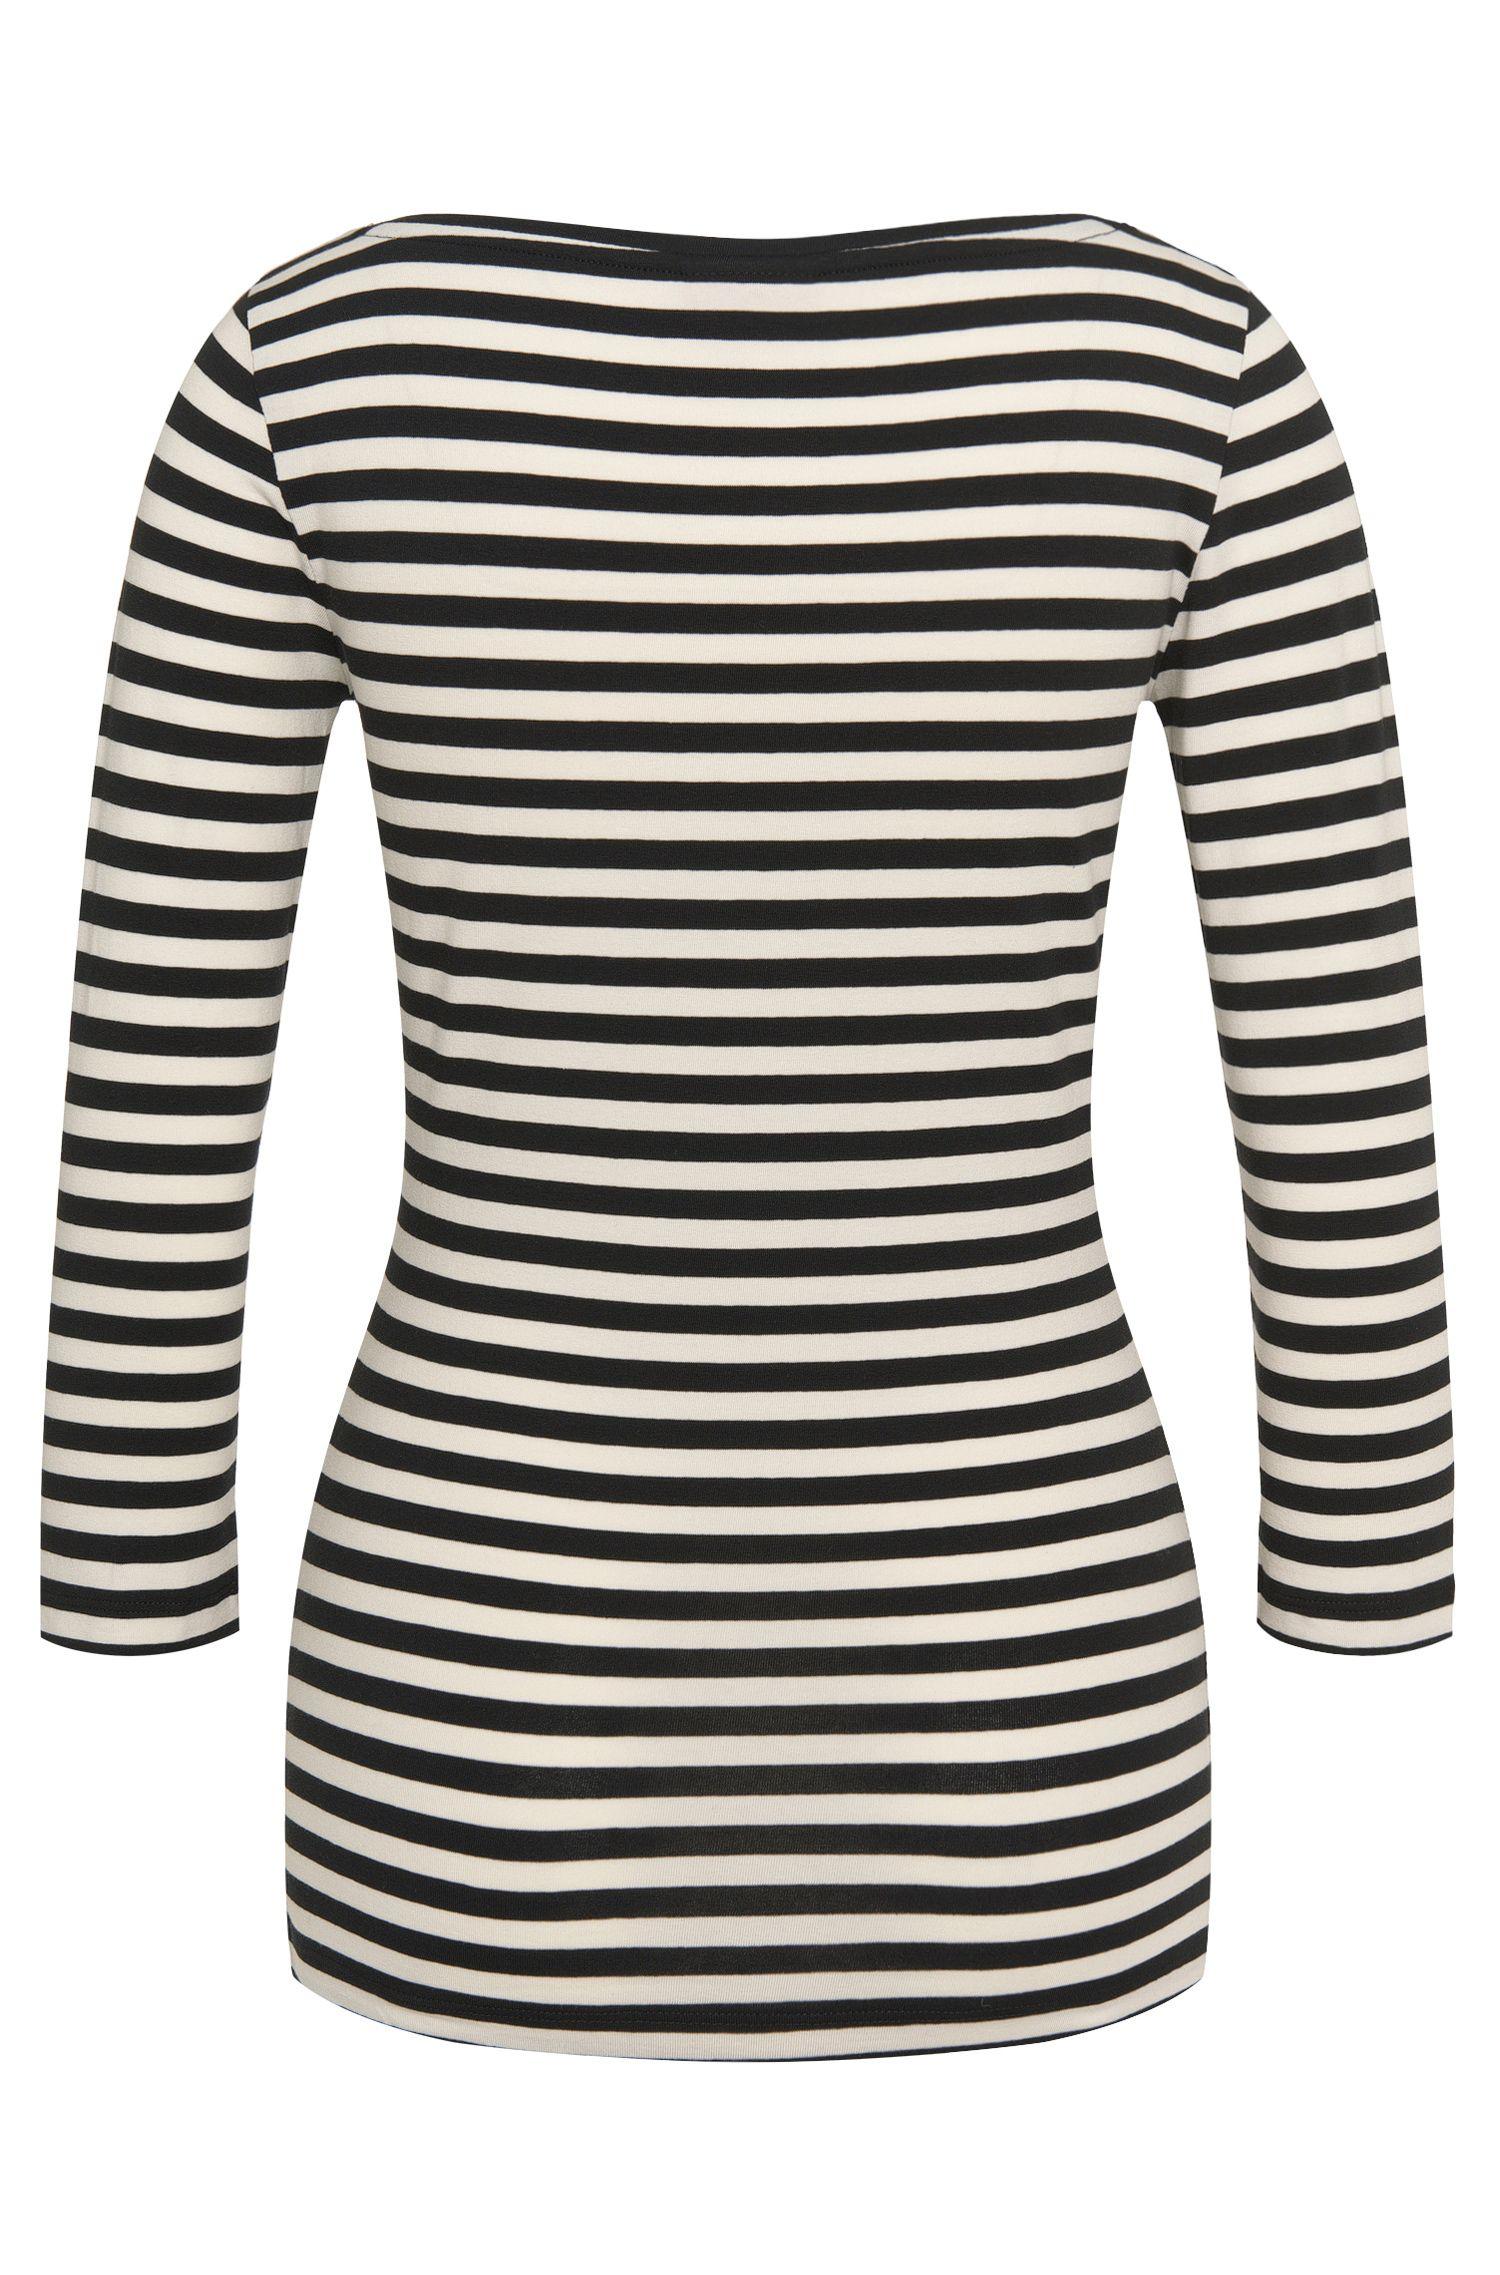 Gestreiftes T-Shirt aus elastischem Baumwoll-Mix: 'Dannala_2'